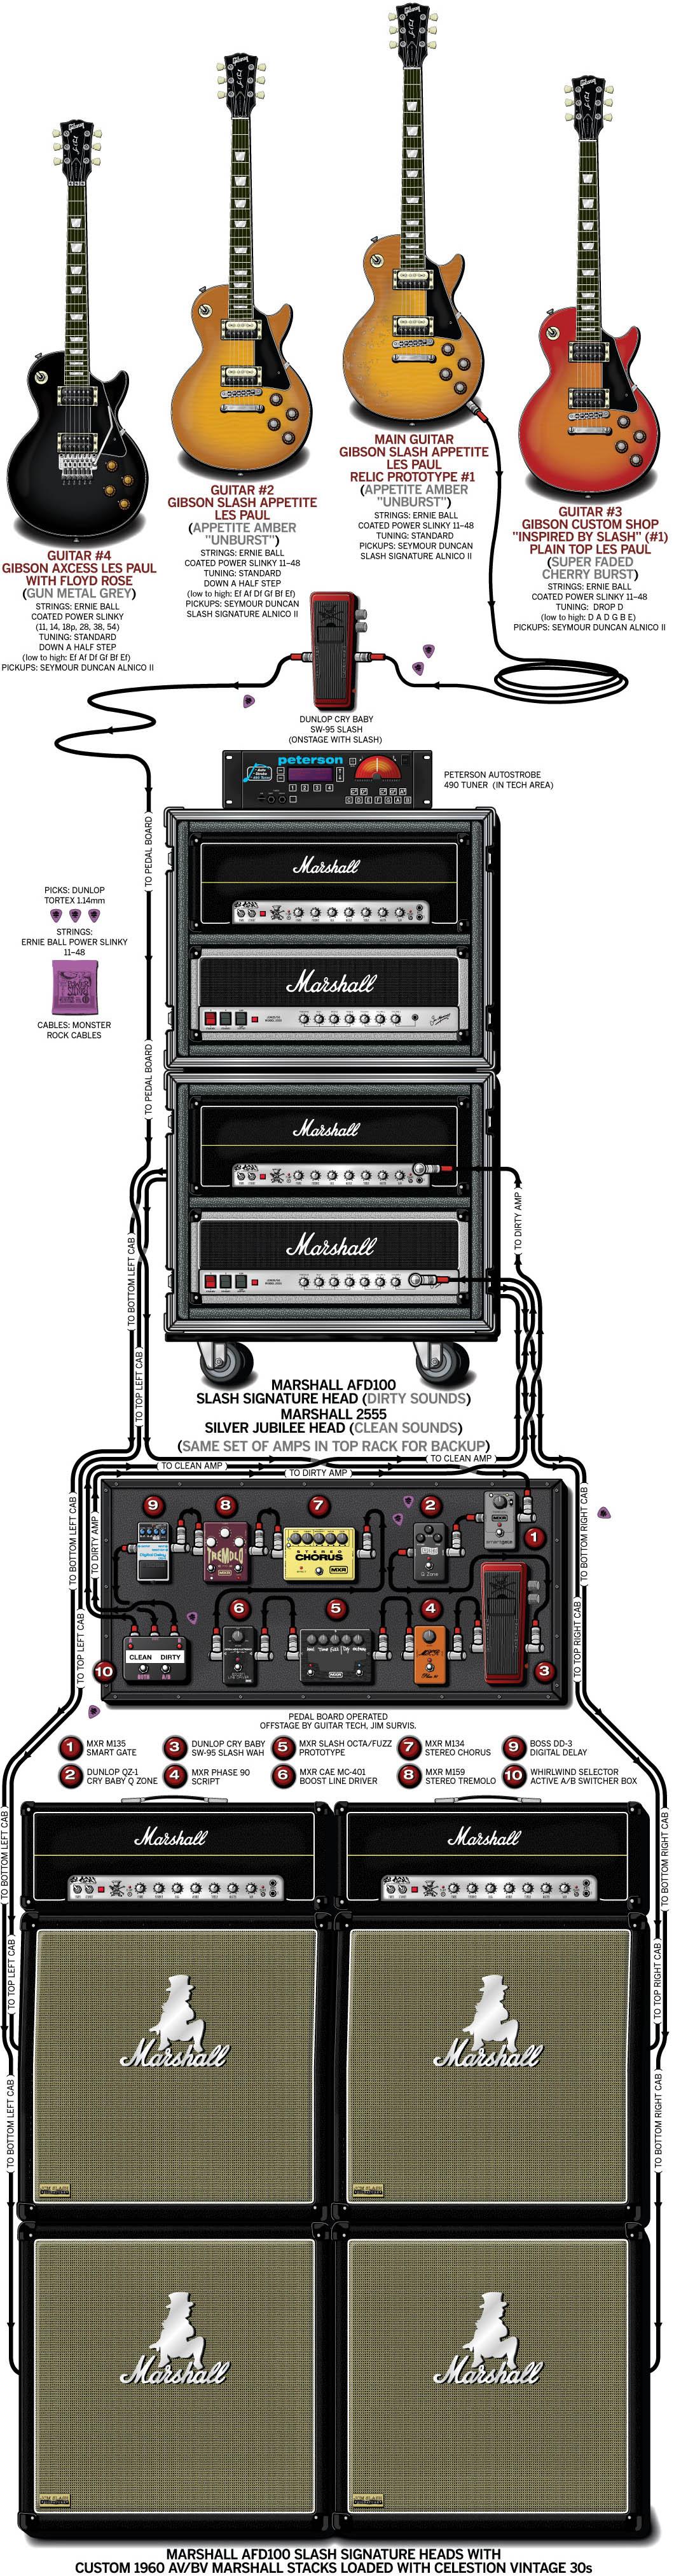 Slash - Guitar Rig and Gear Setup - 2011